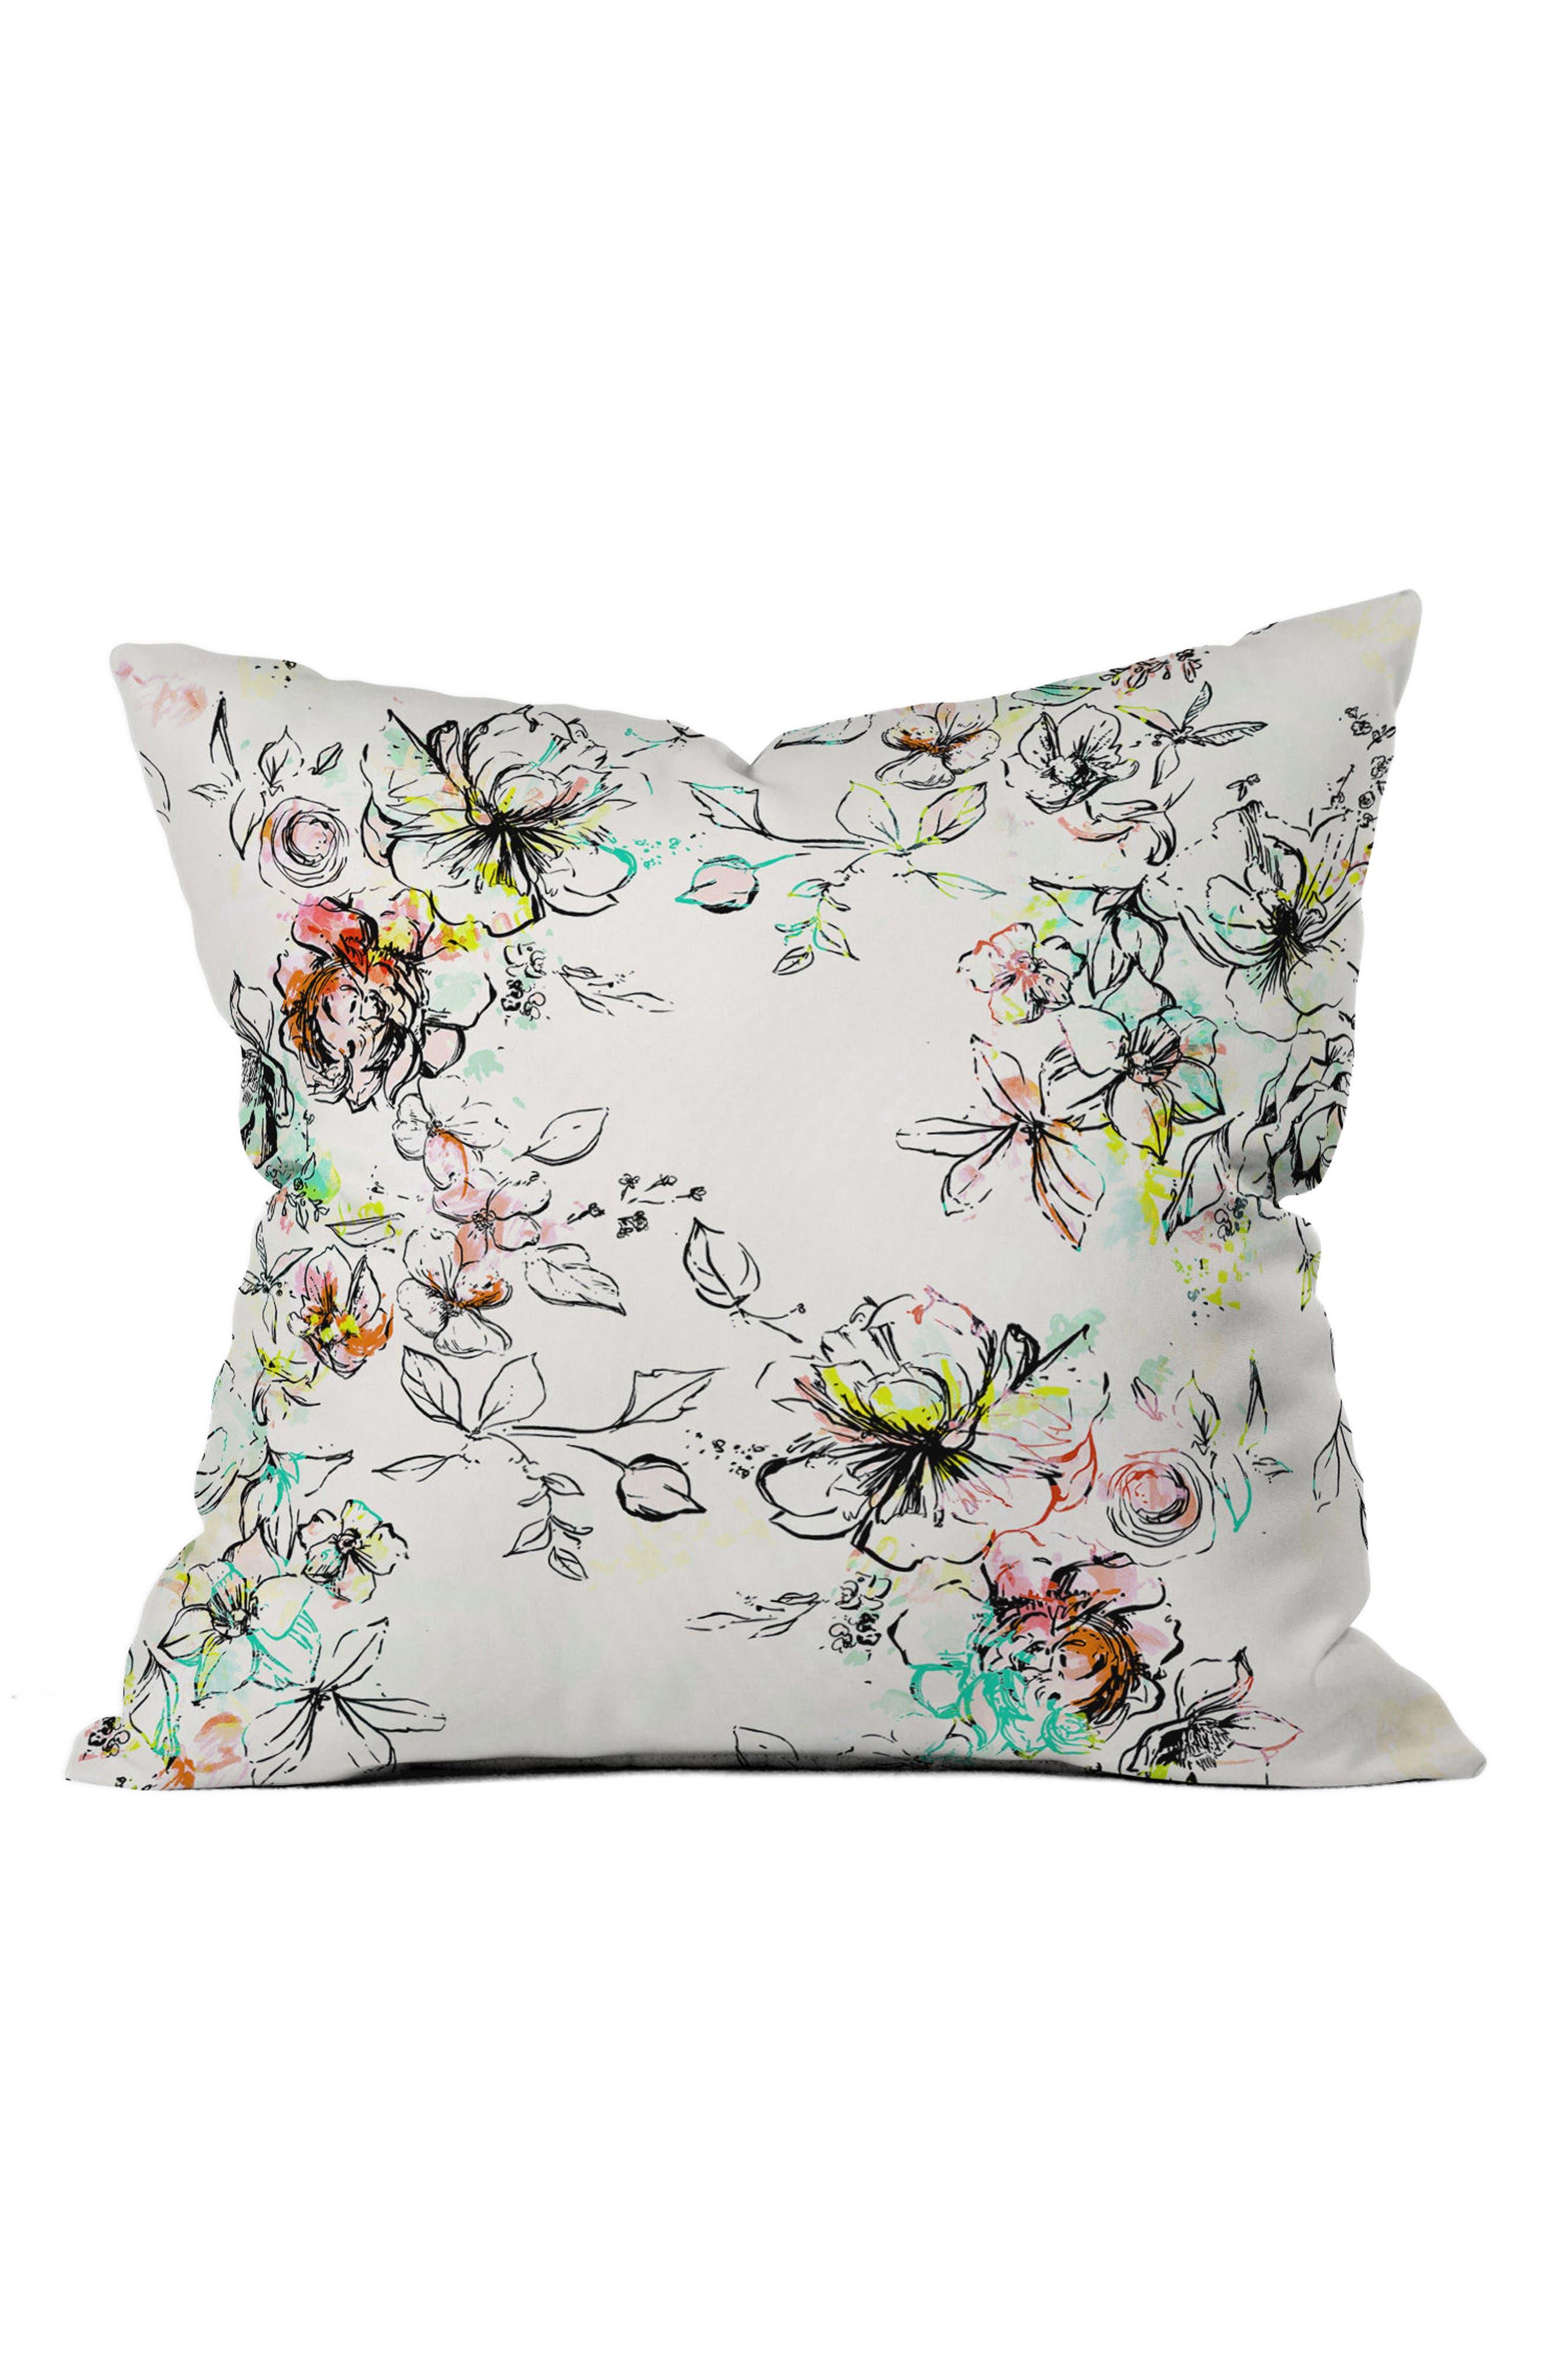 Floral Pillow,                         Main,                         color, White/ Multi